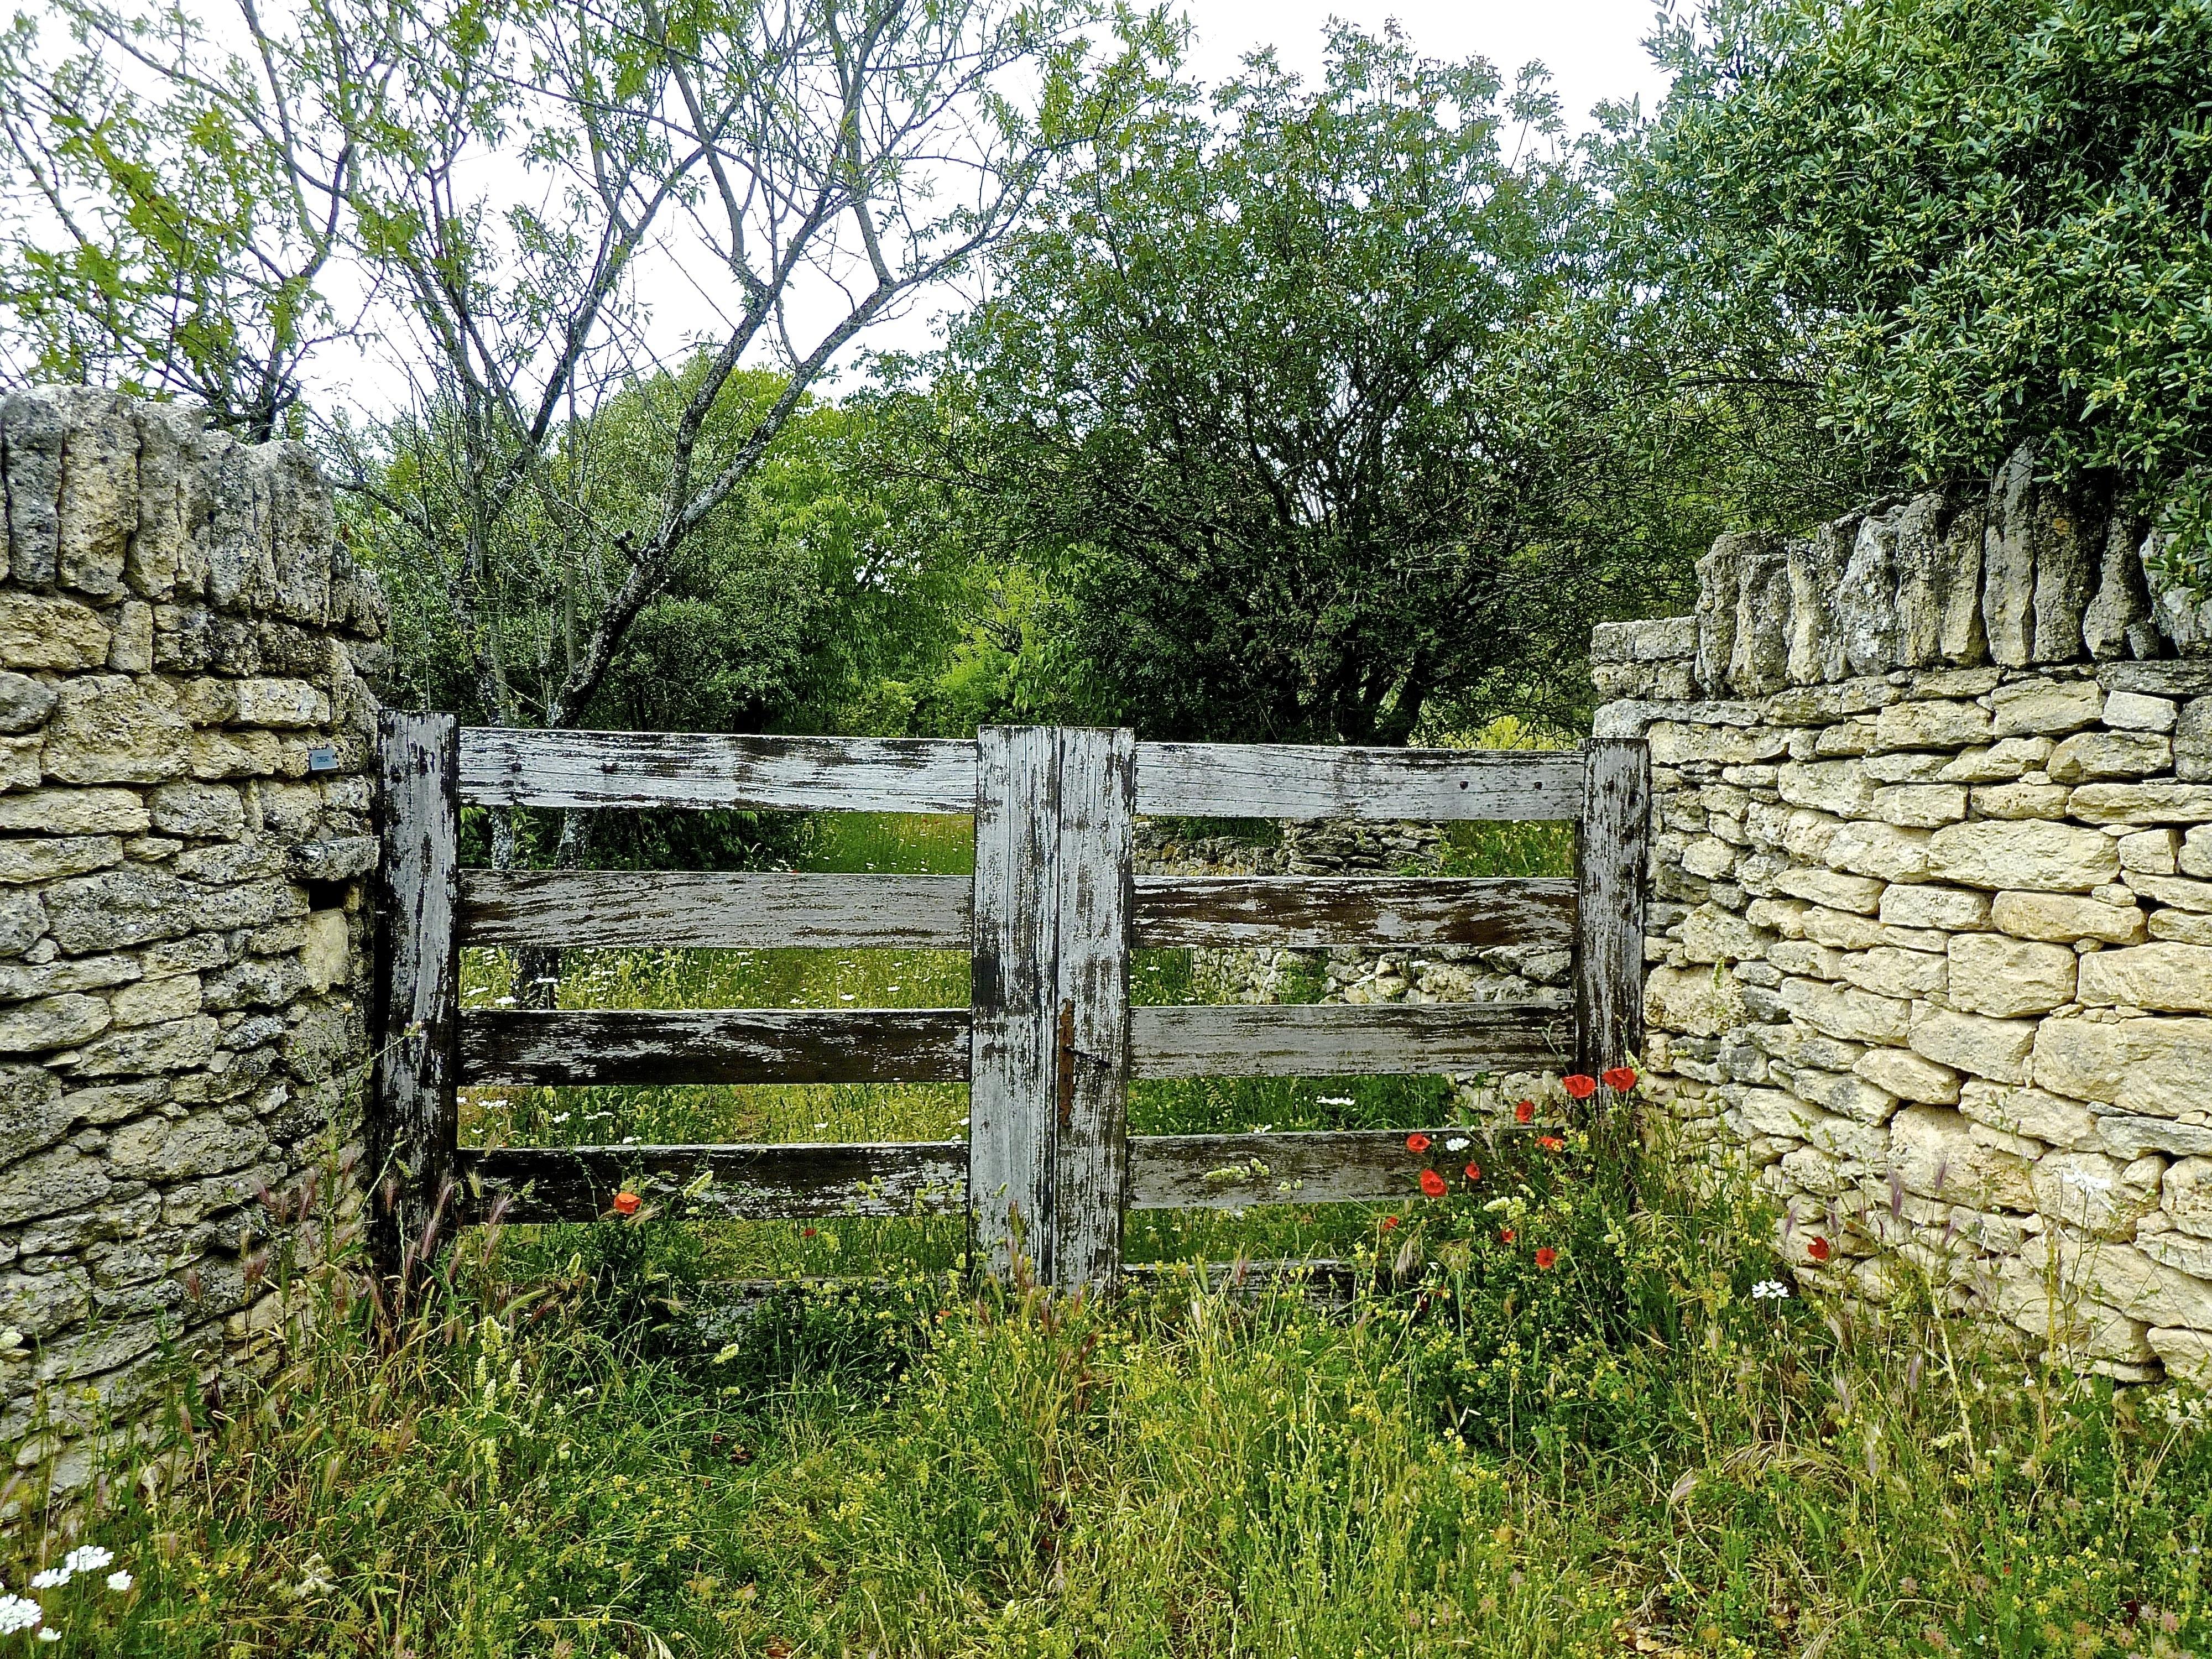 Fotos gratis : rock, cerca, césped, pared, Pasarela, verde, Entrada ...